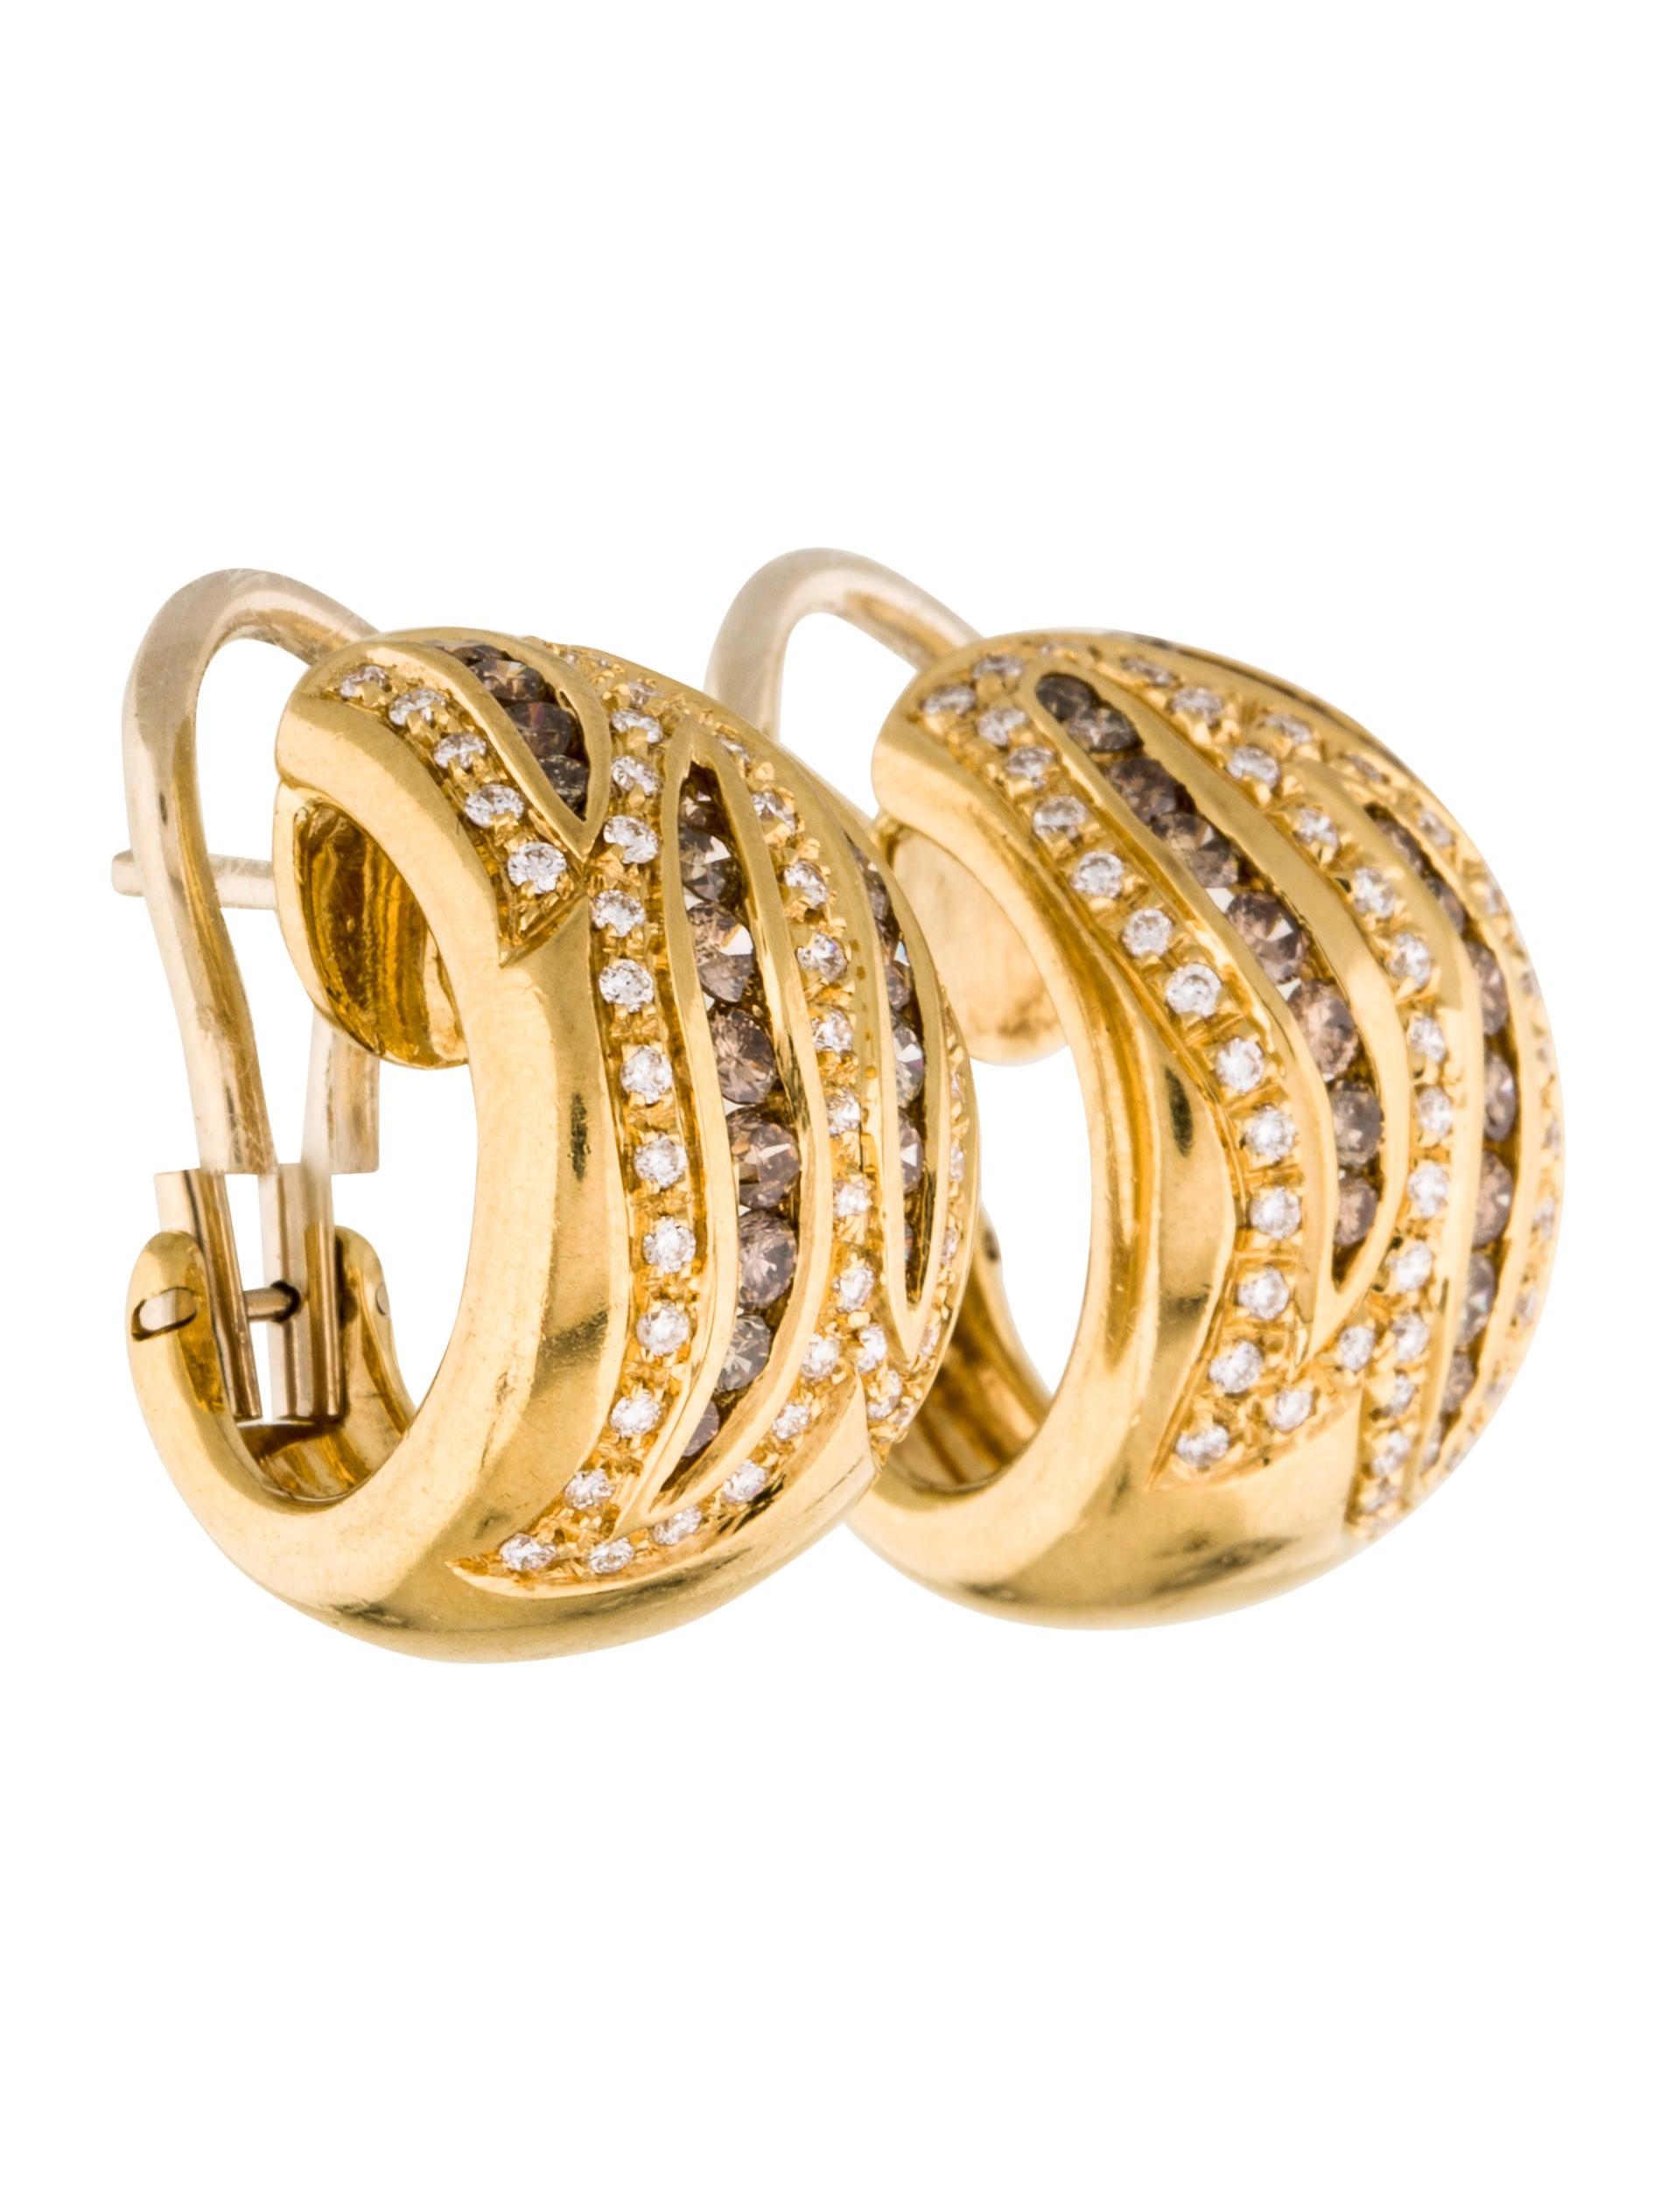 Damiani Brown & White Diamond Huggie Earrings Earrings